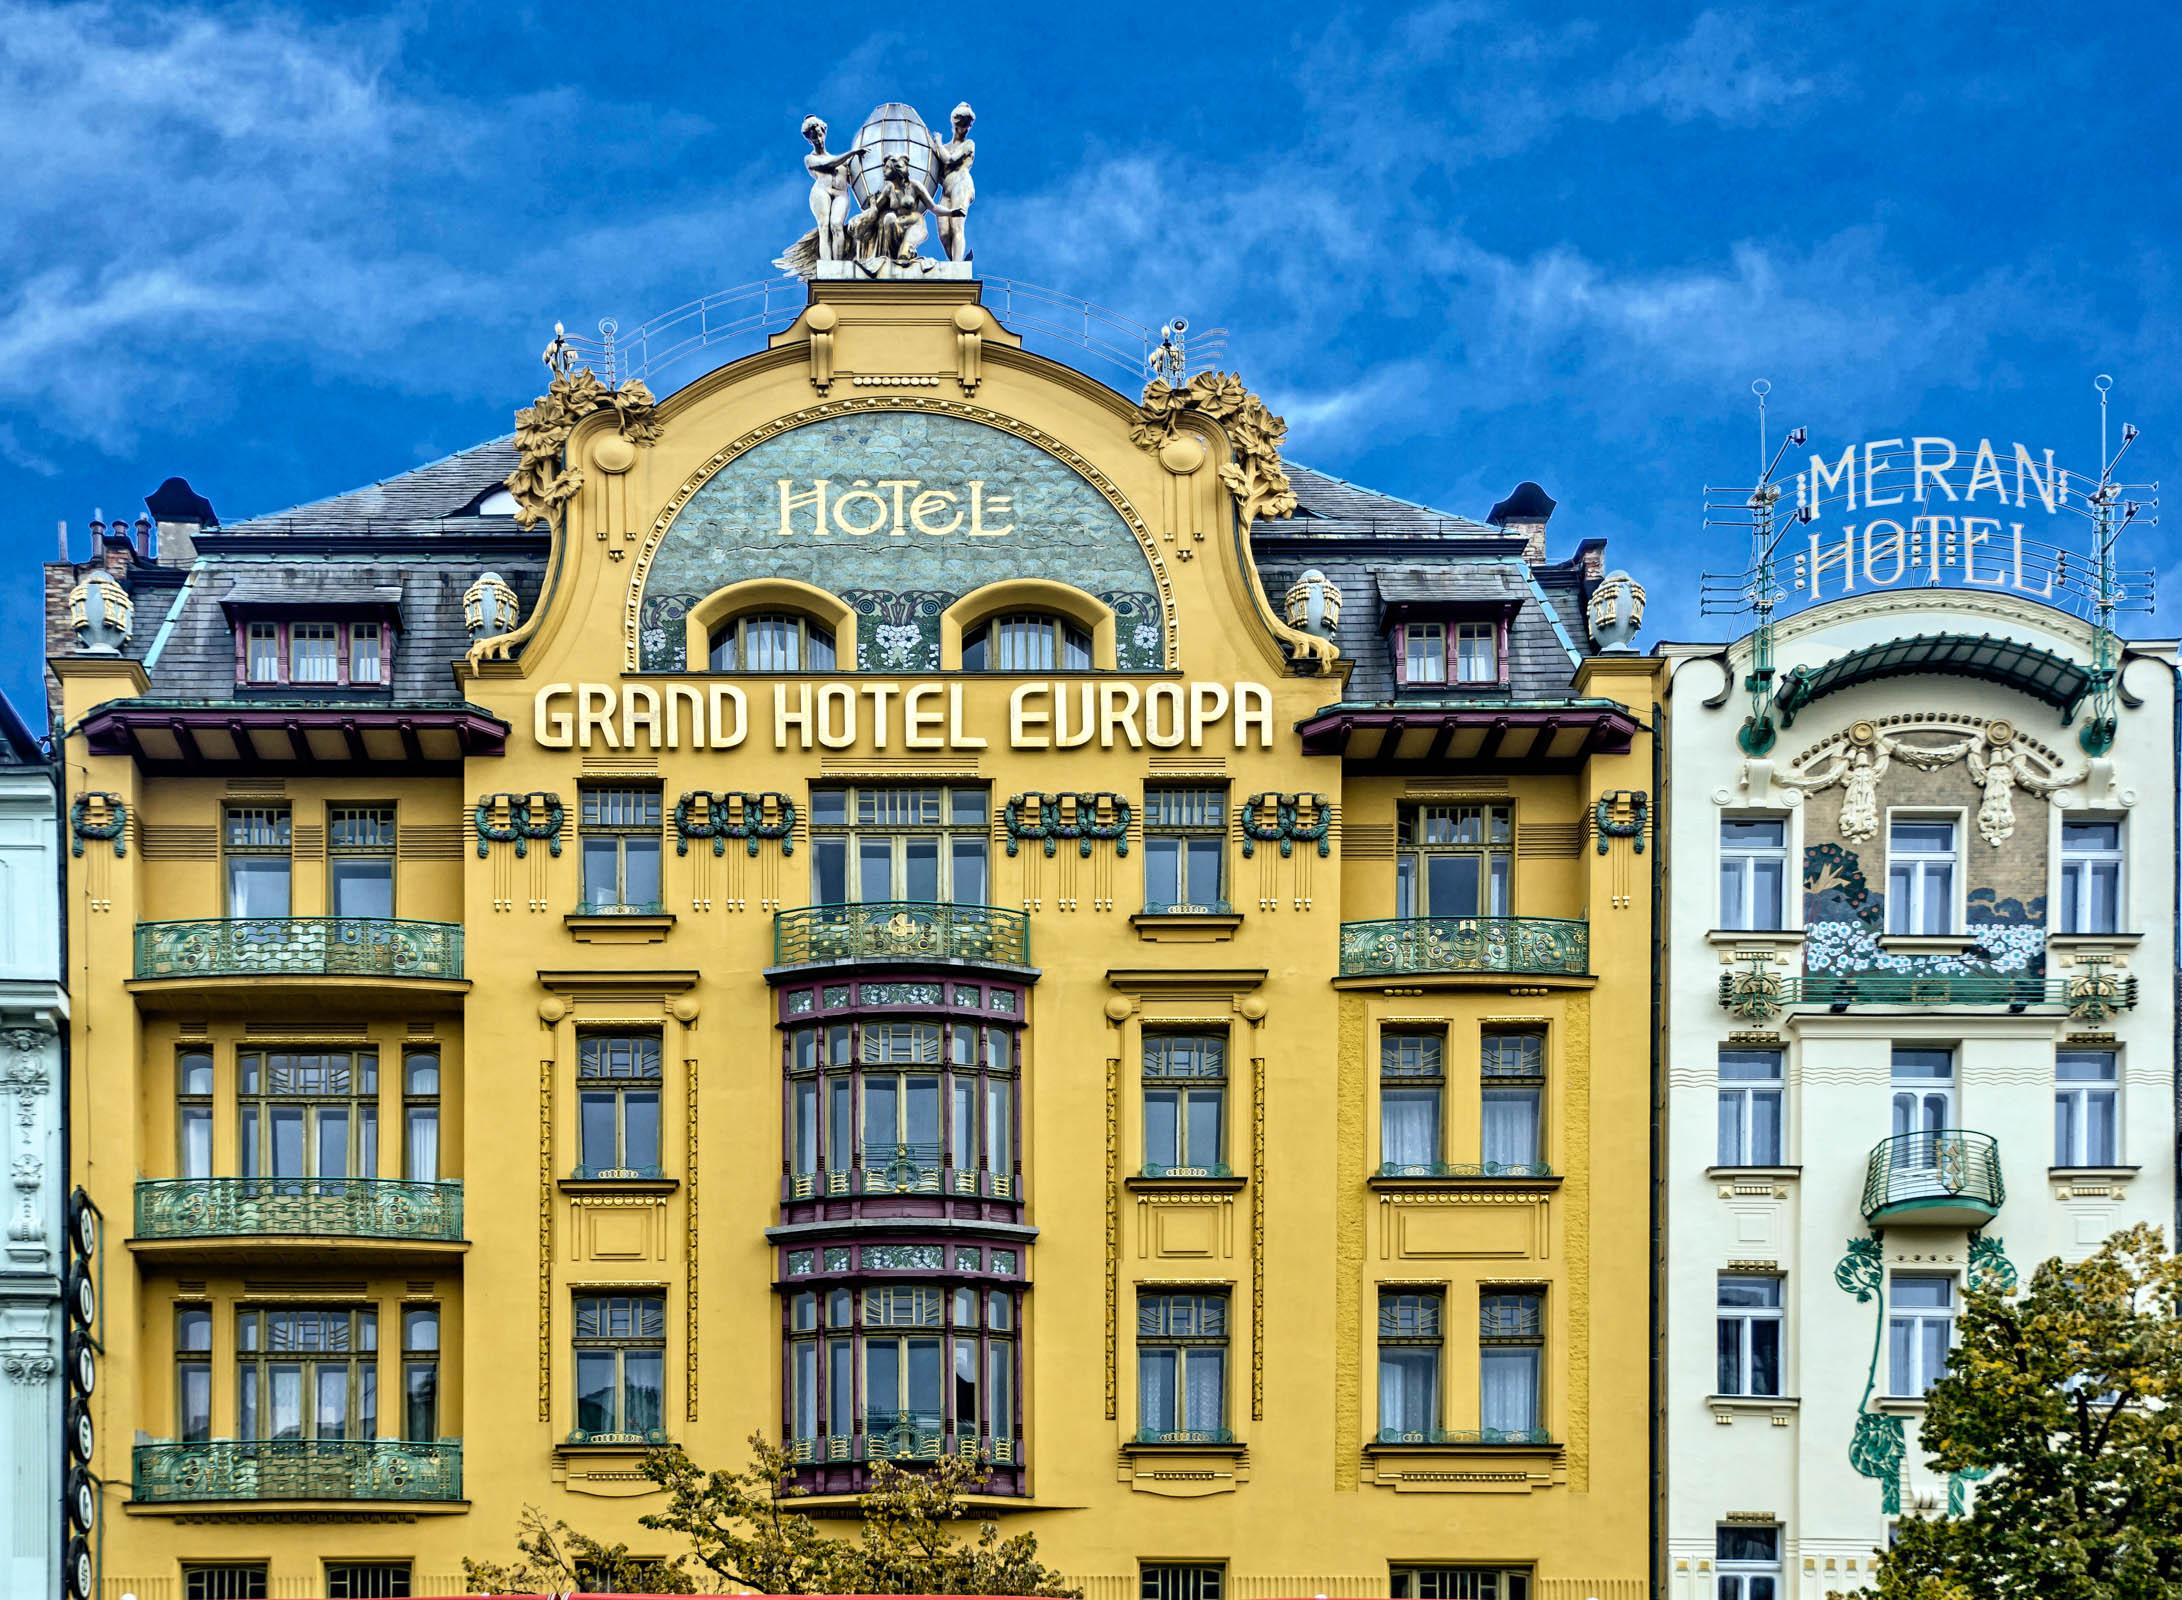 Grand Hotel Europa Anstalt